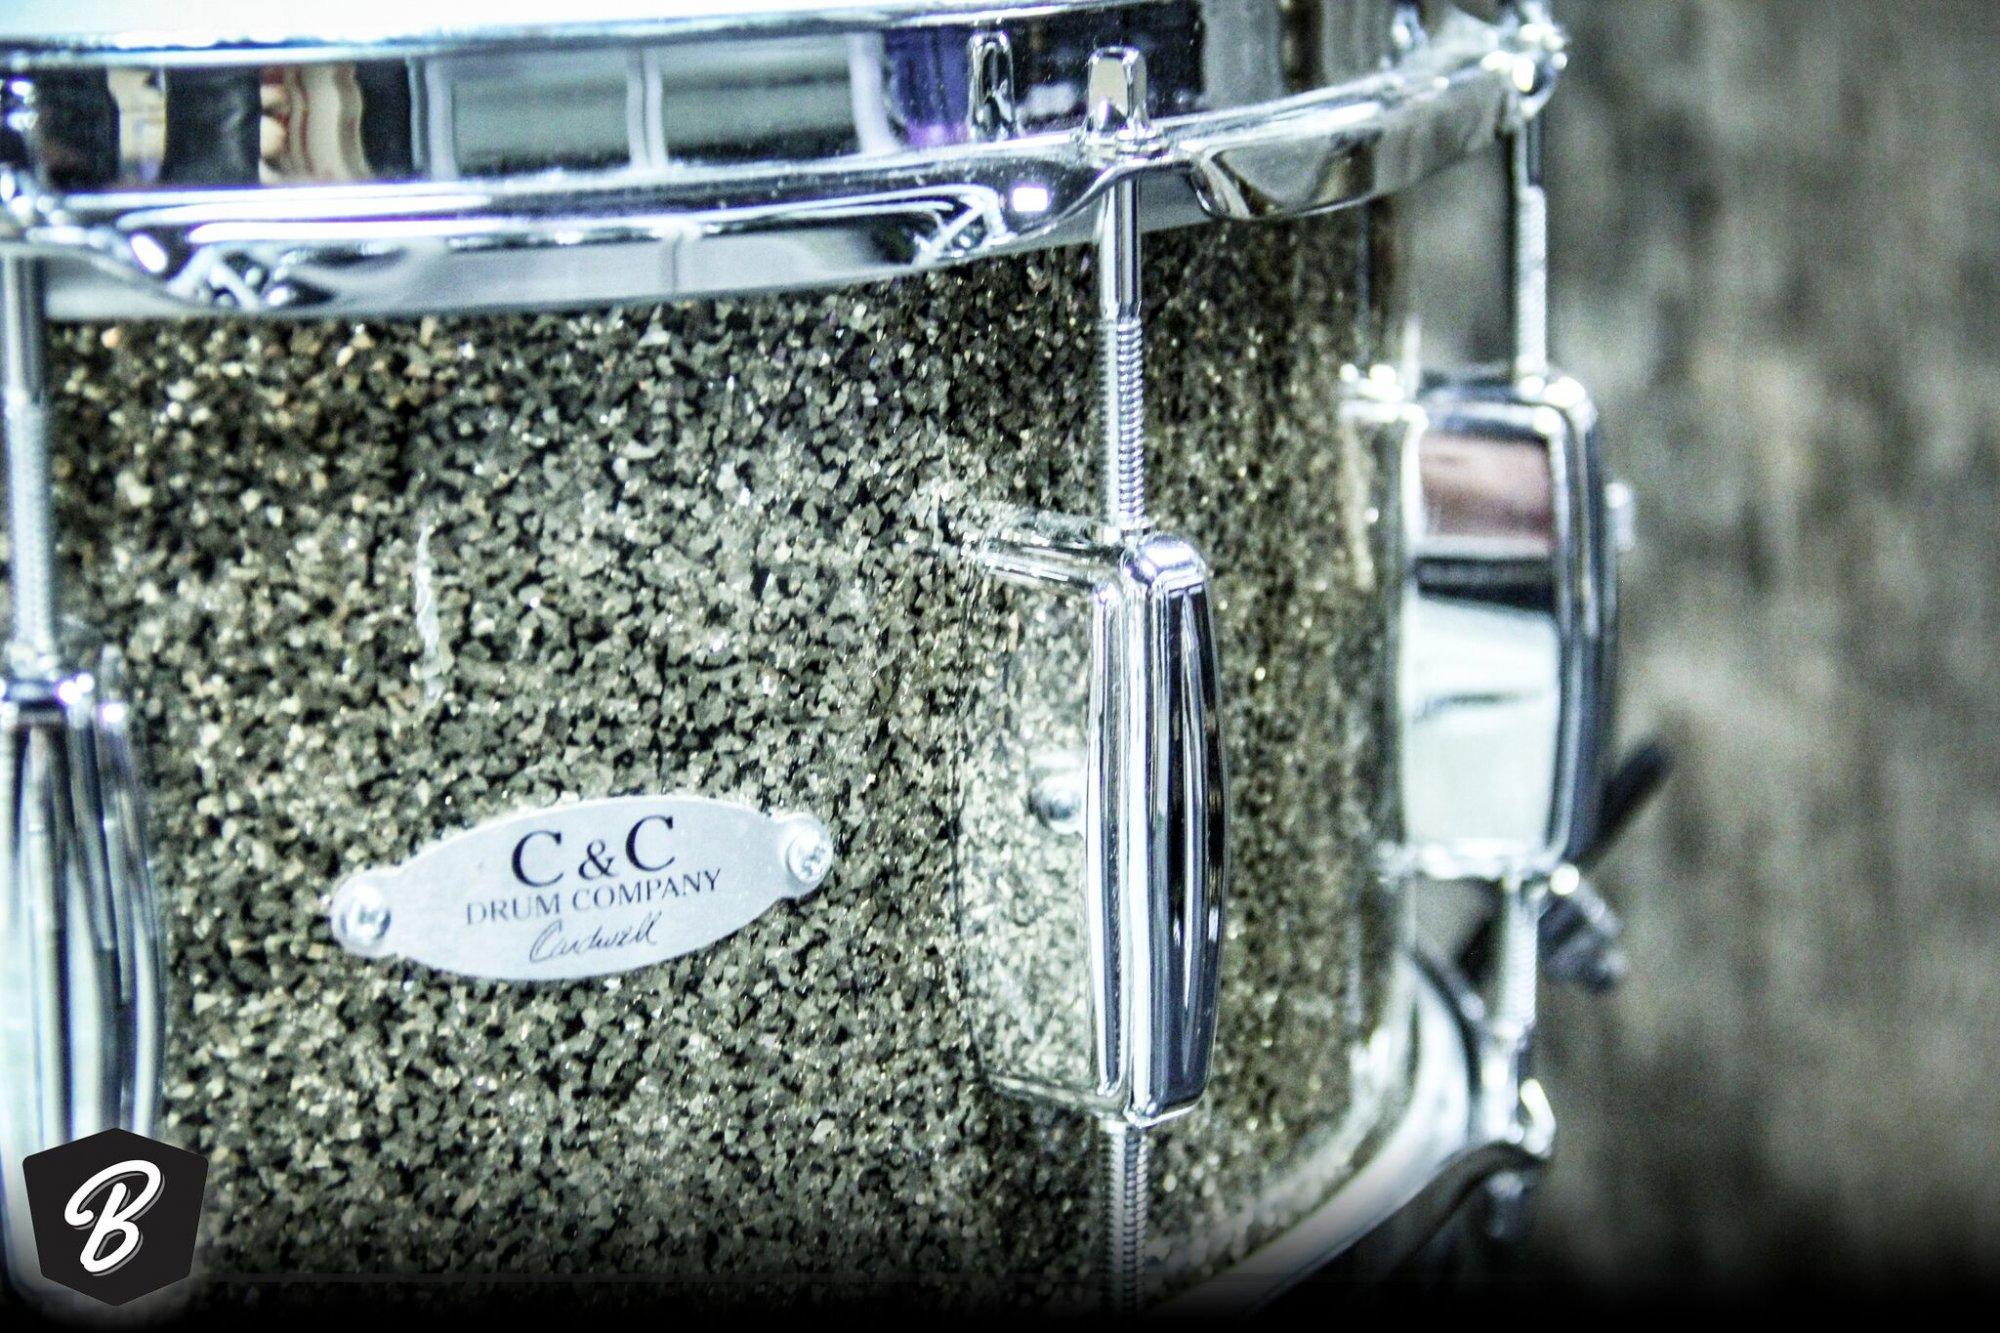 C&C Drum Company 6.5x14 Gladstone Snare in Ginger Glitter